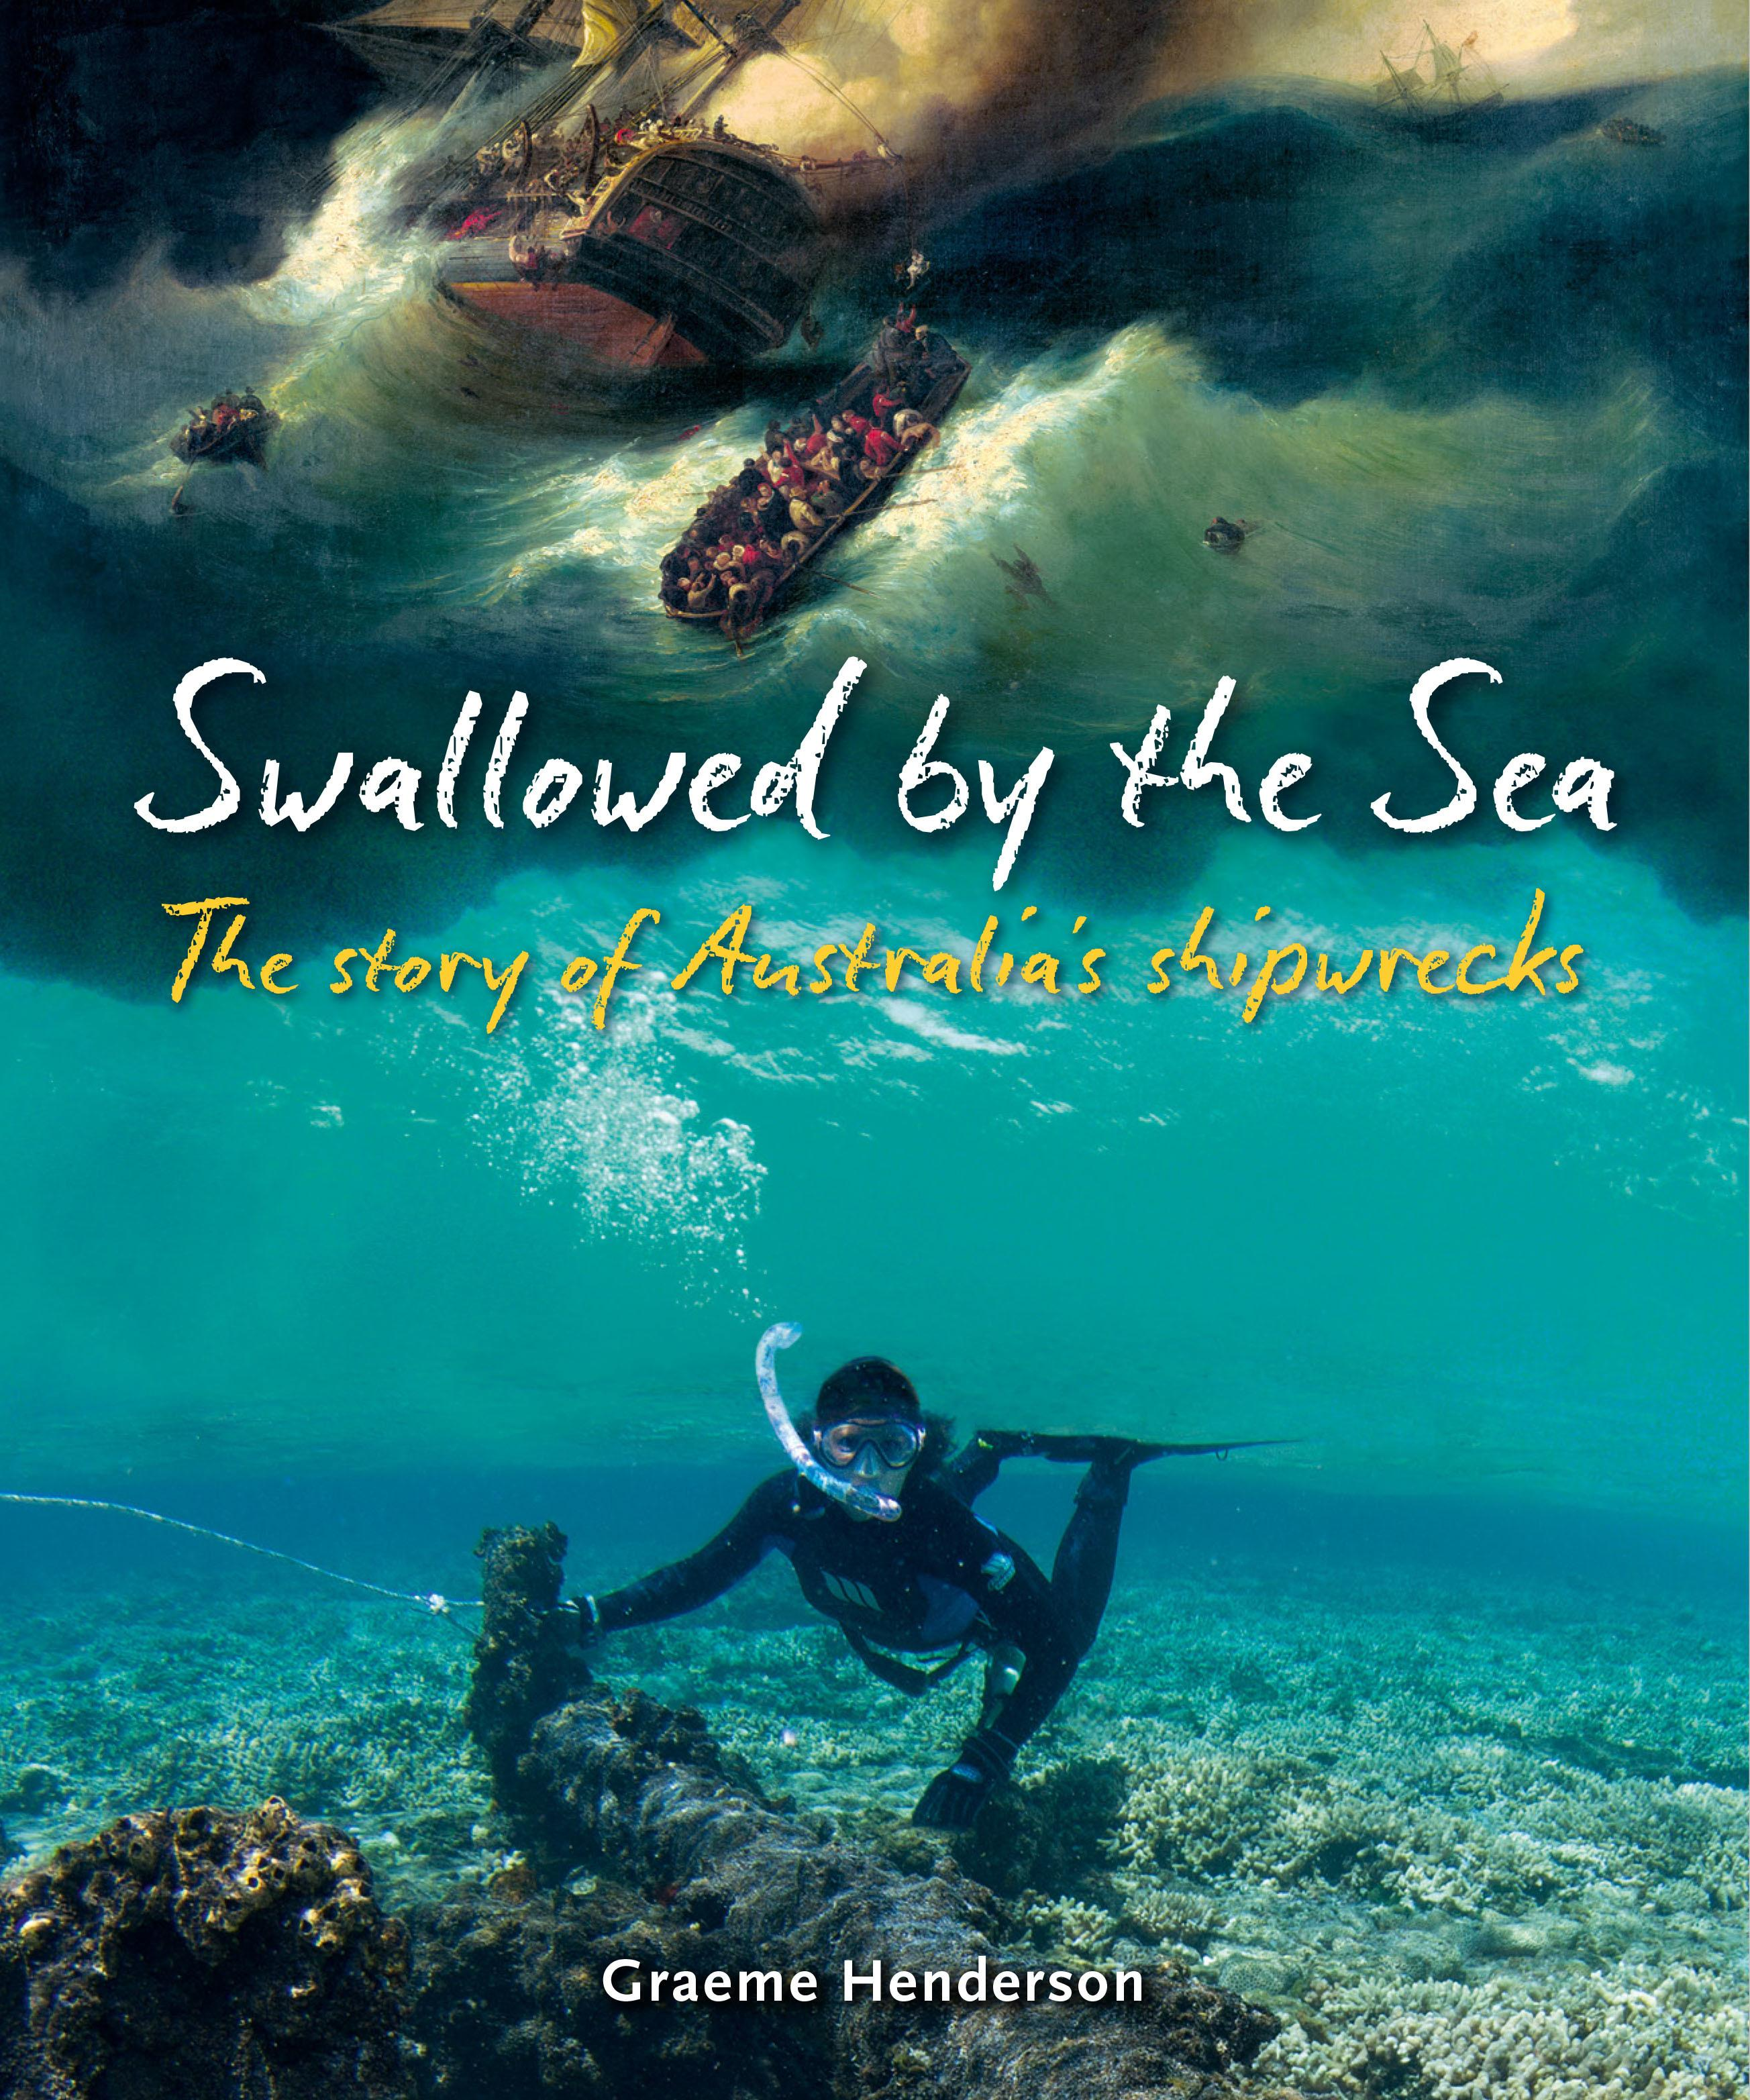 Swallowed by the Sea: The Story ofAustralia'sShipwrecks